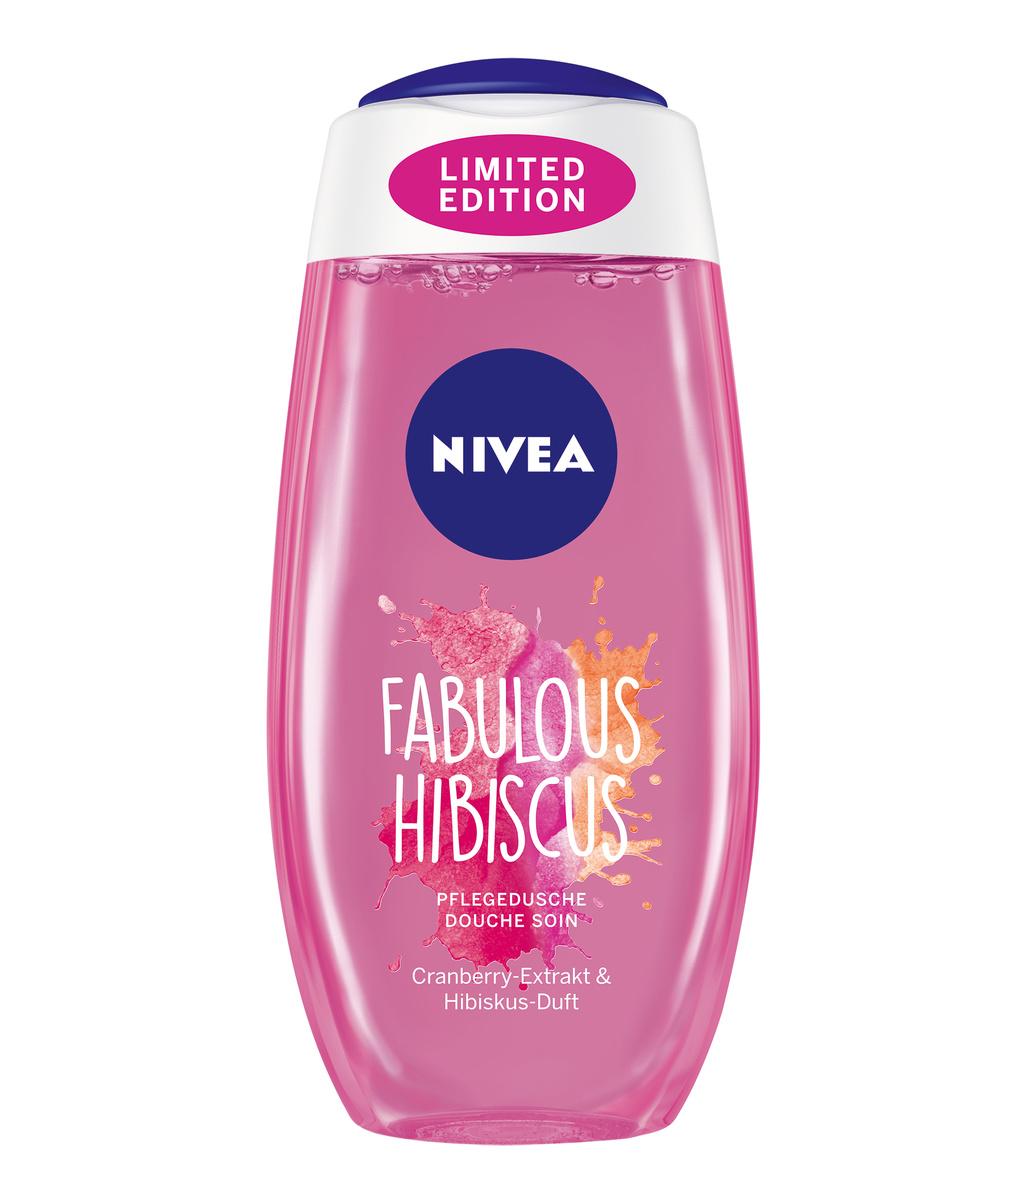 NIVEA_Fabulous_Hibiscus_gel_za_tuširanje